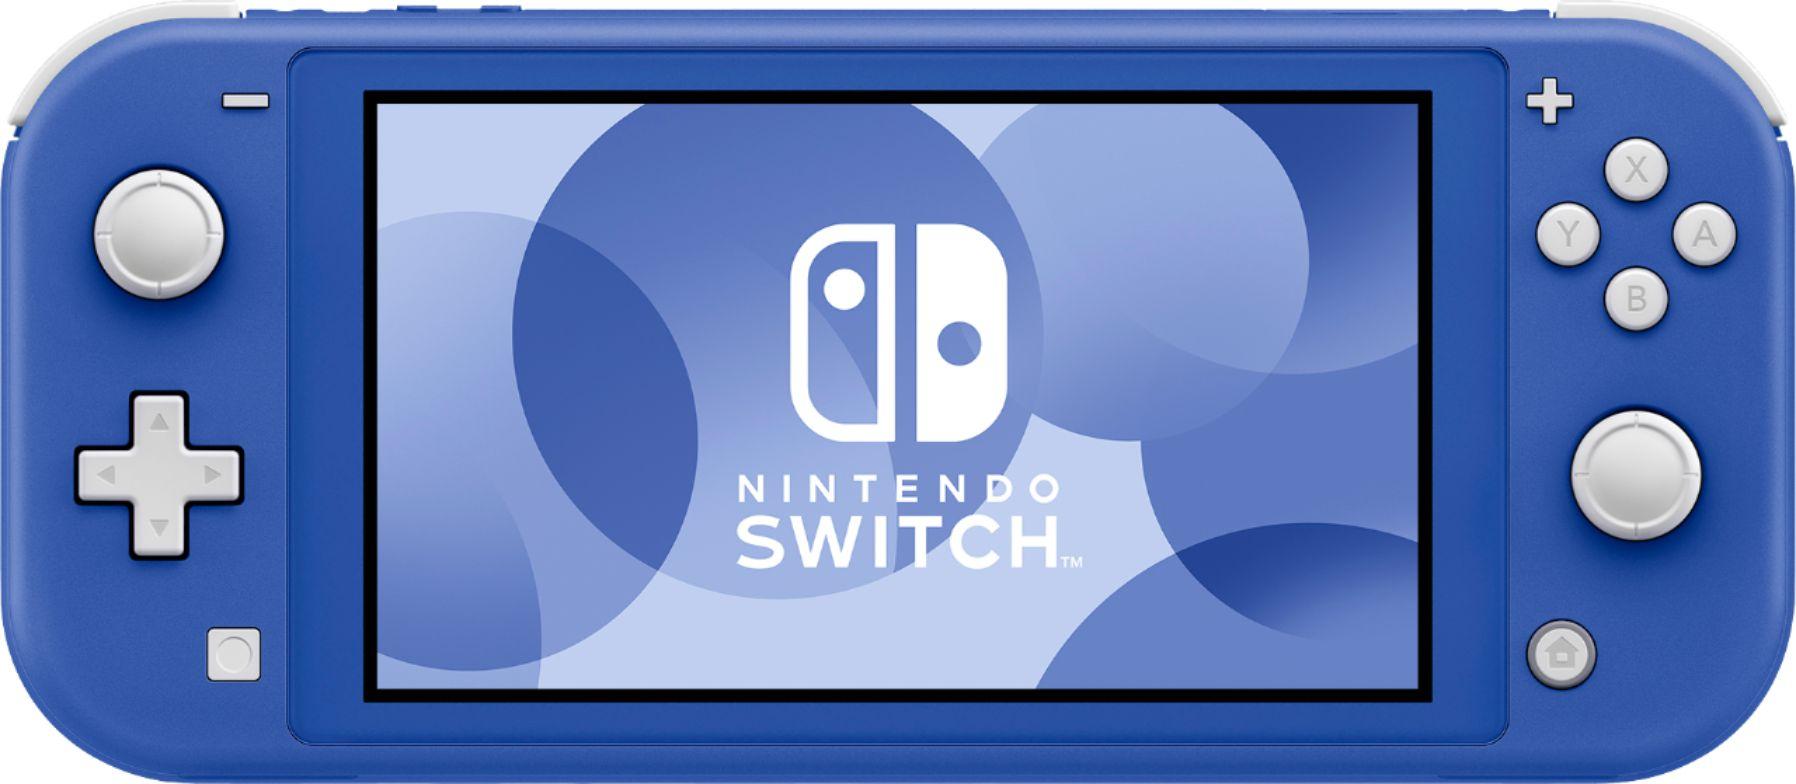 32GB Switch Lite + 128GB Micro SD Card - $200 (Best Buy)